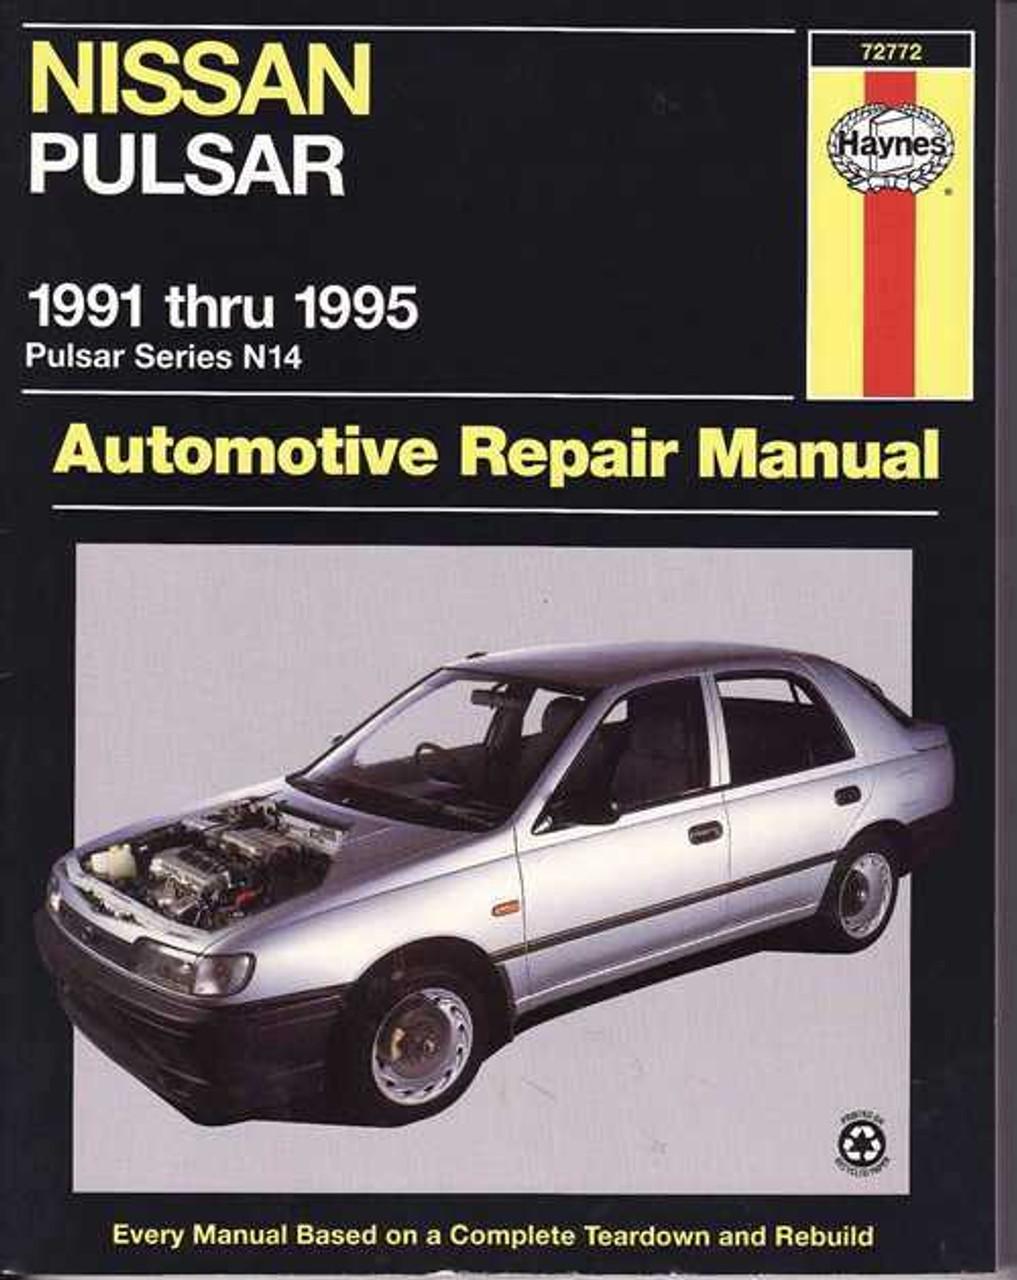 nissan pulsar n14 1991 1995 workshop manual rh automotobookshop com au nissan pulsar n15 repair manual free download nissan pulsar gtir haynes manual